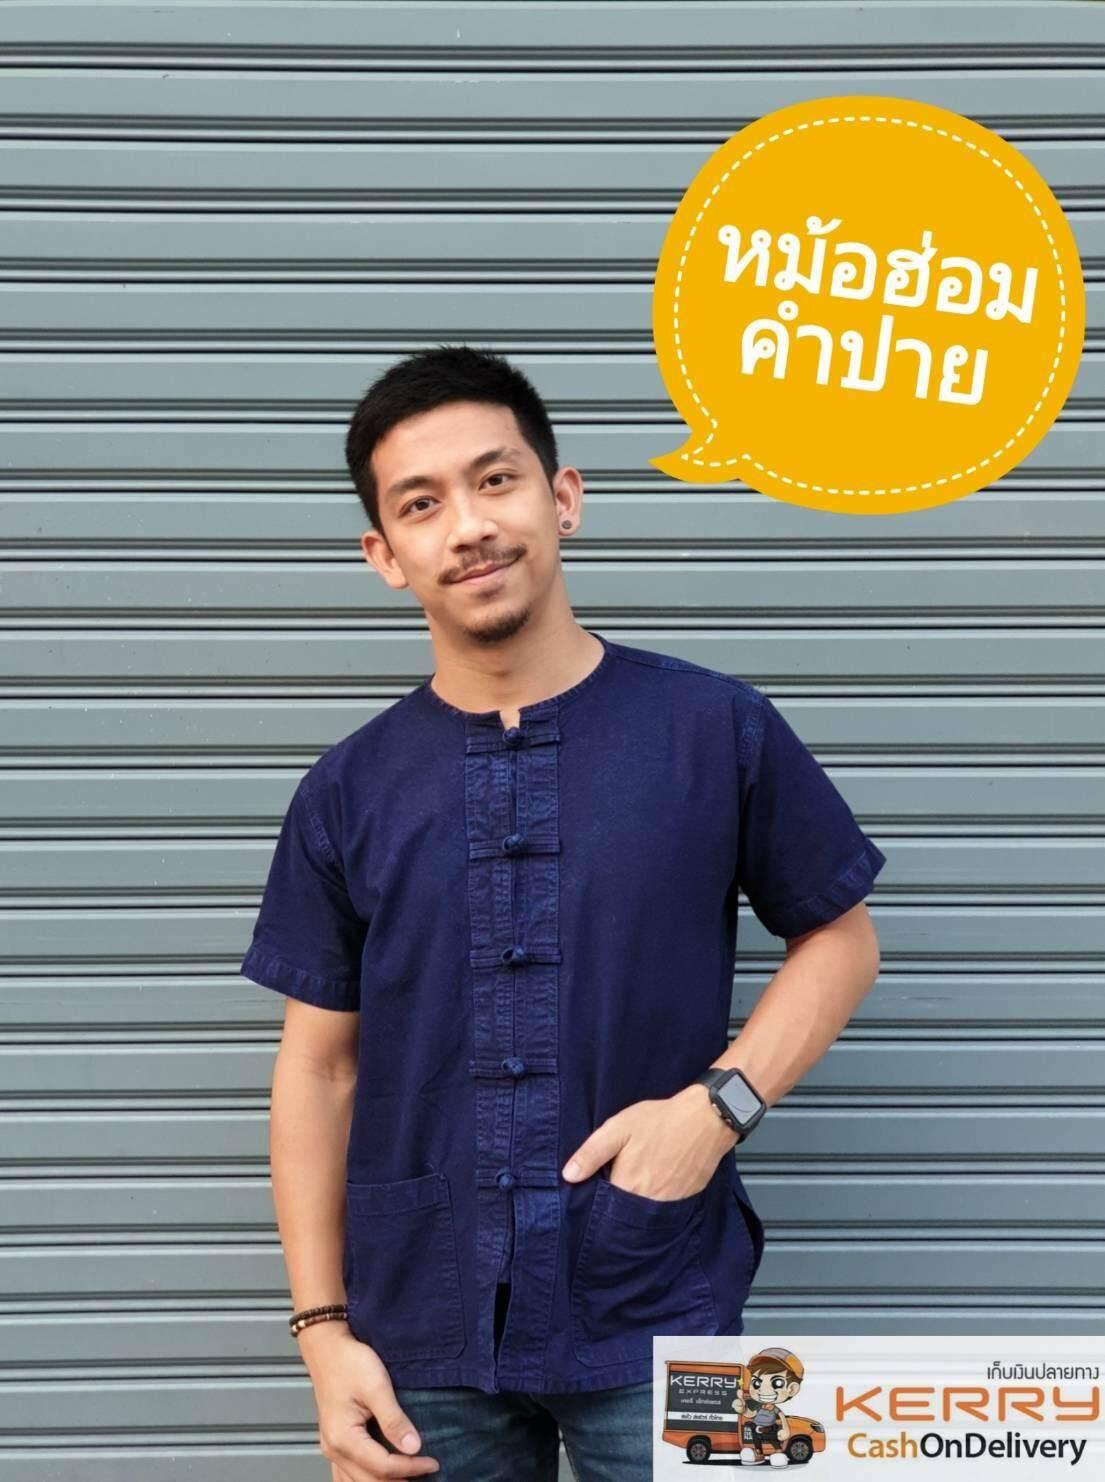 T Shirt-Lanna (สินค้าคุณภาพจากผู้ผลิต ผ้าหม้อฮ่อมเมืองแพร่) เสื้อหม้อฮ่อม คอกลม กระดุมจีน แบบดั้งเดิม Original (ผู้ชายพอดีตัว) (ผู้หญิงมีทรงเฉพาะเข้ารูป) By Kom_pie_shirts.